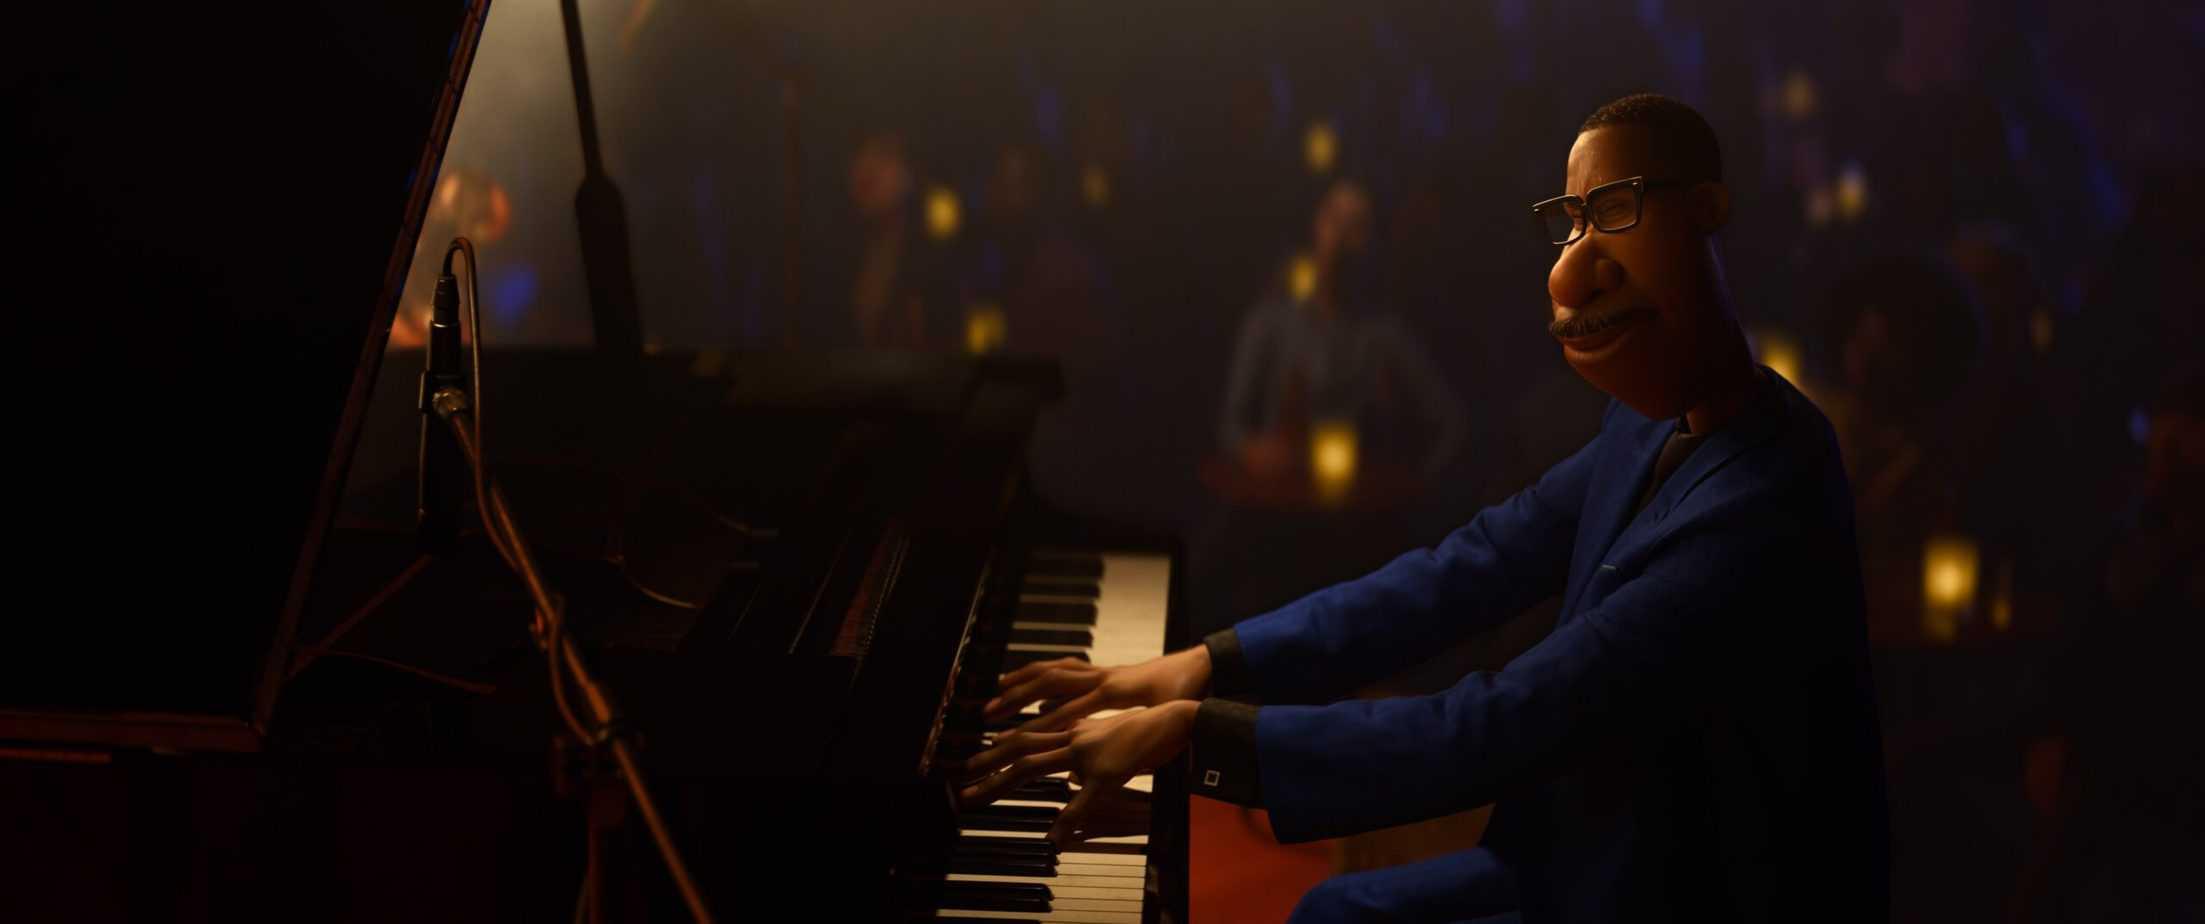 is soul safe for kids? joe gardner playing piano in Disney Pixar's Soul